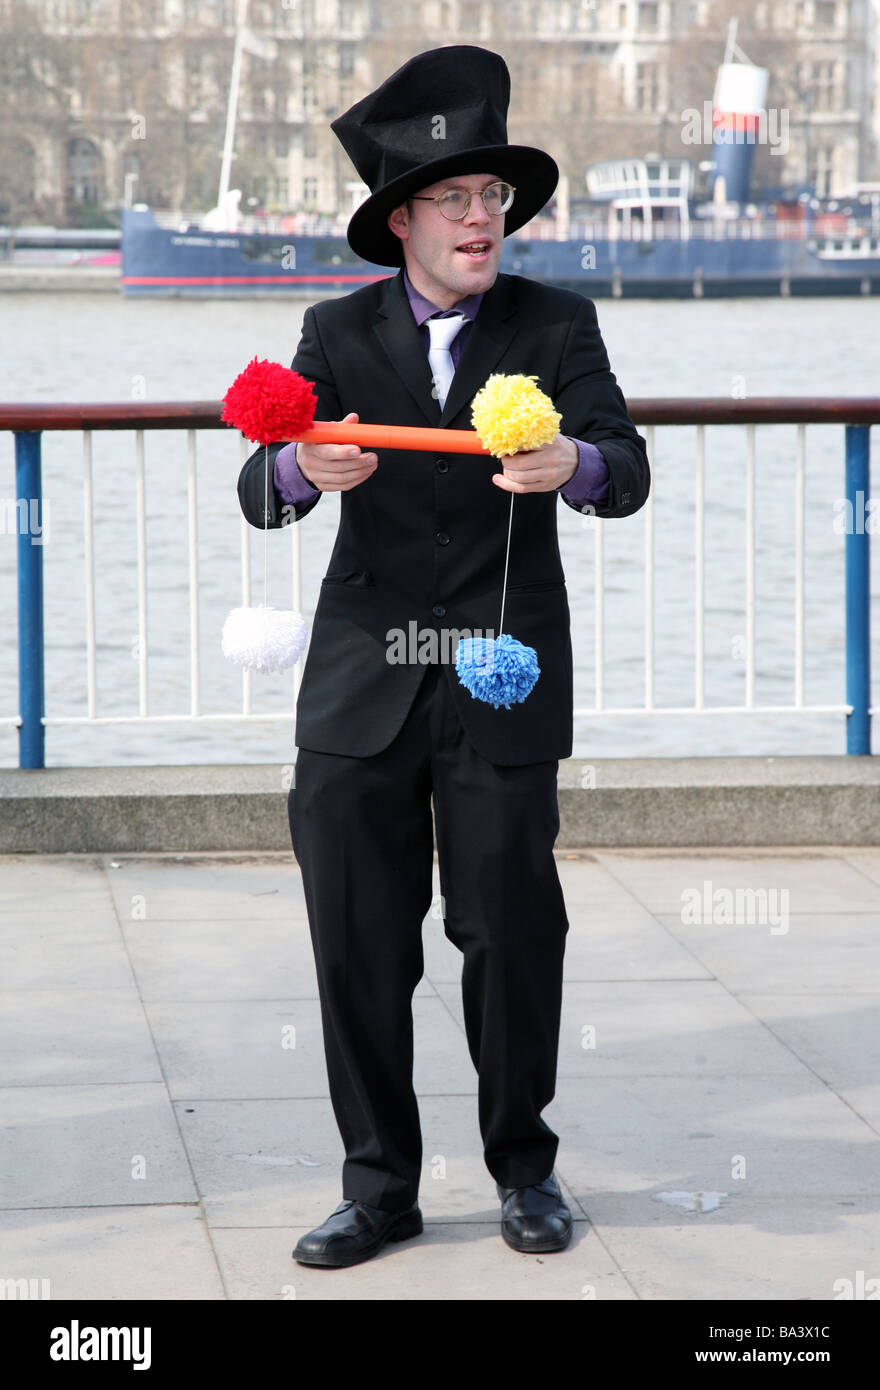 Street performer, South Bank, London - Stock Image